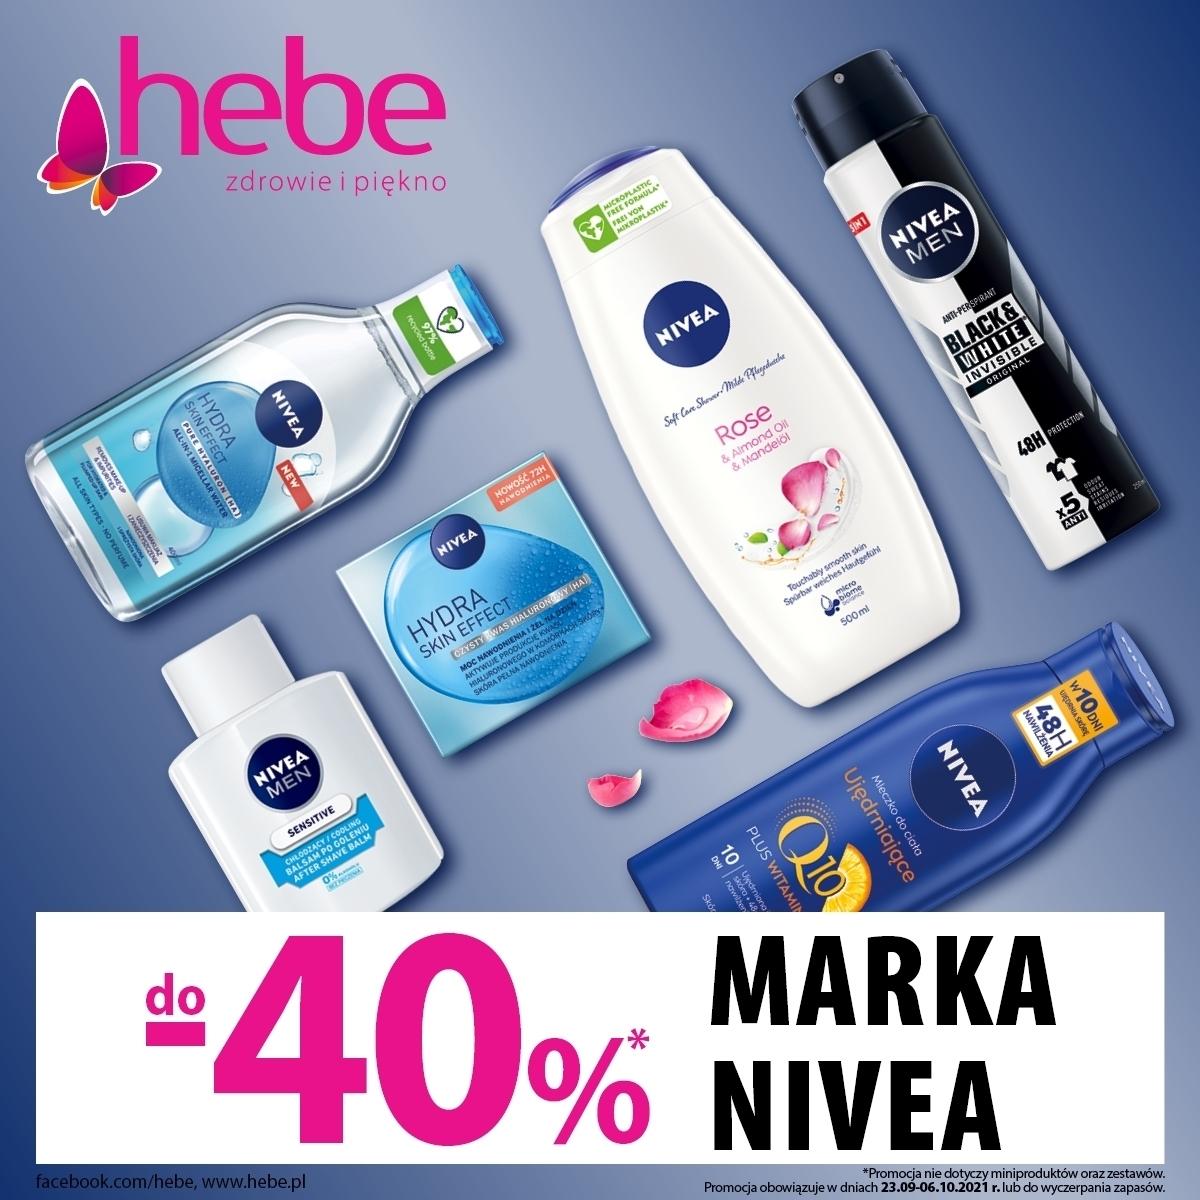 Promocja w hebe - marka Nivea taniej